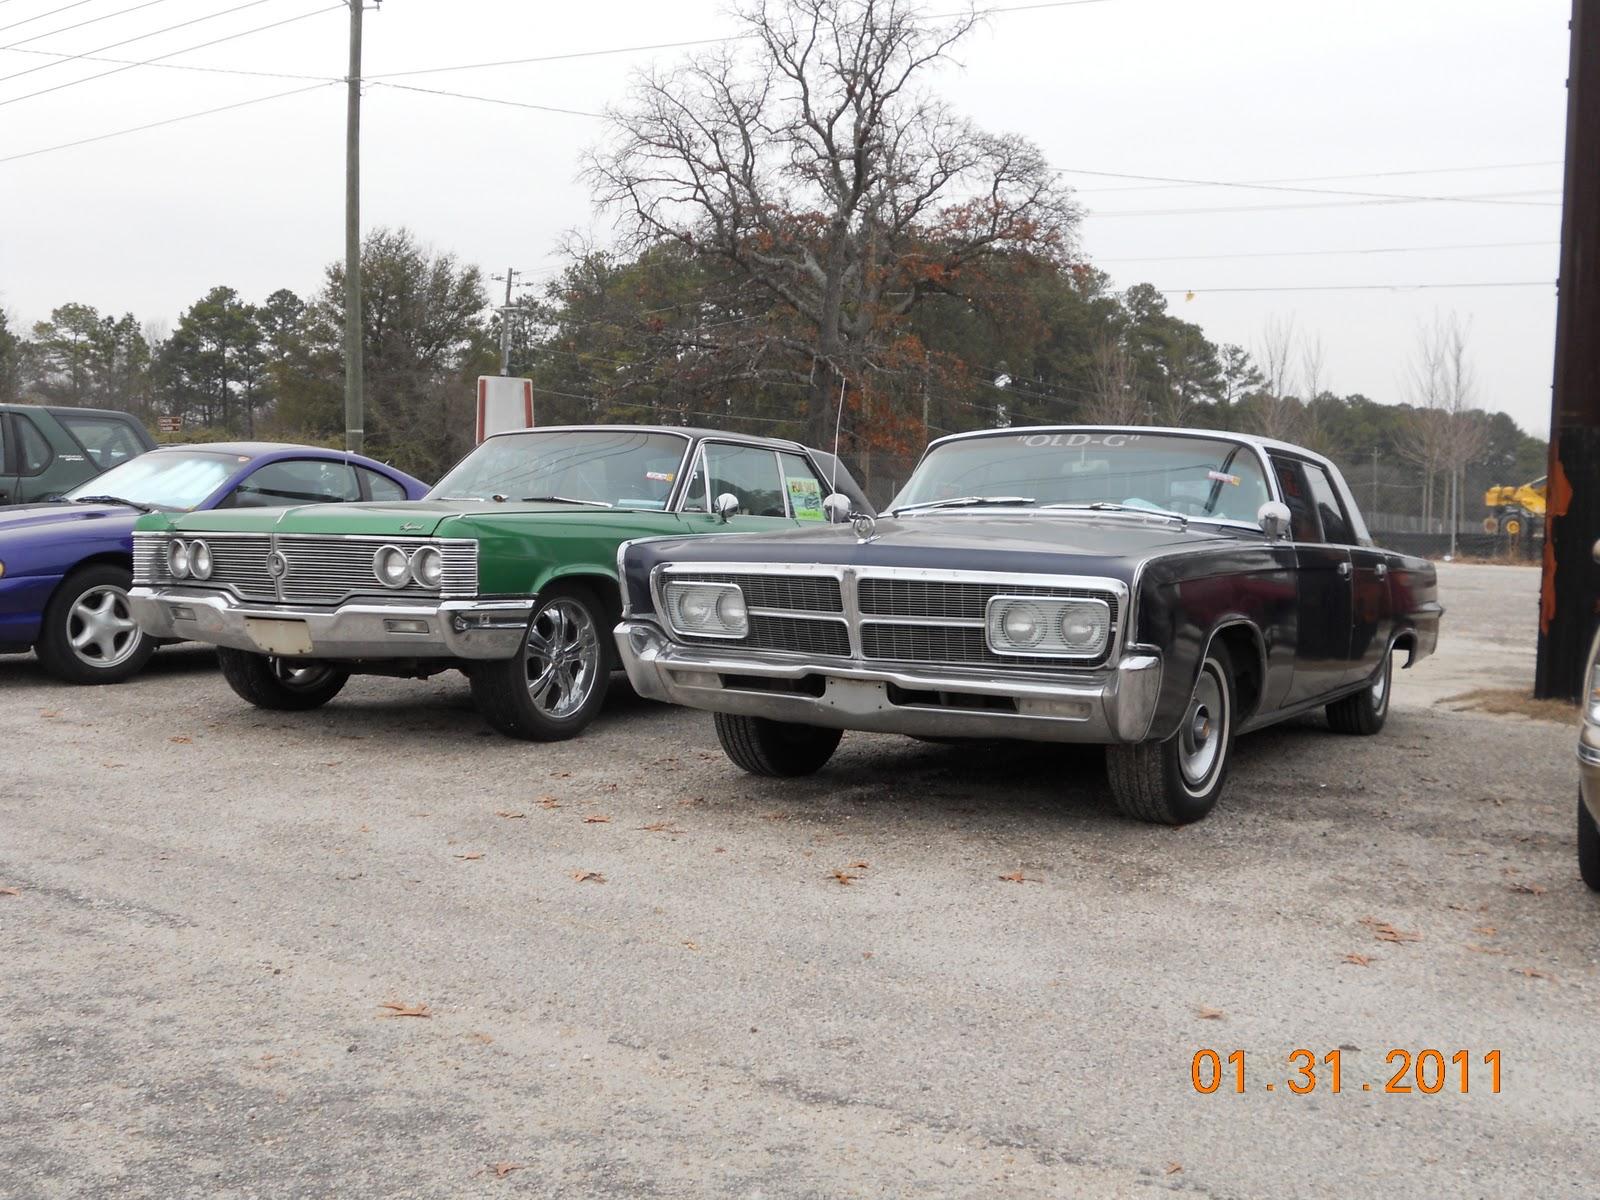 1965 & 1968 Chrysler Imperials